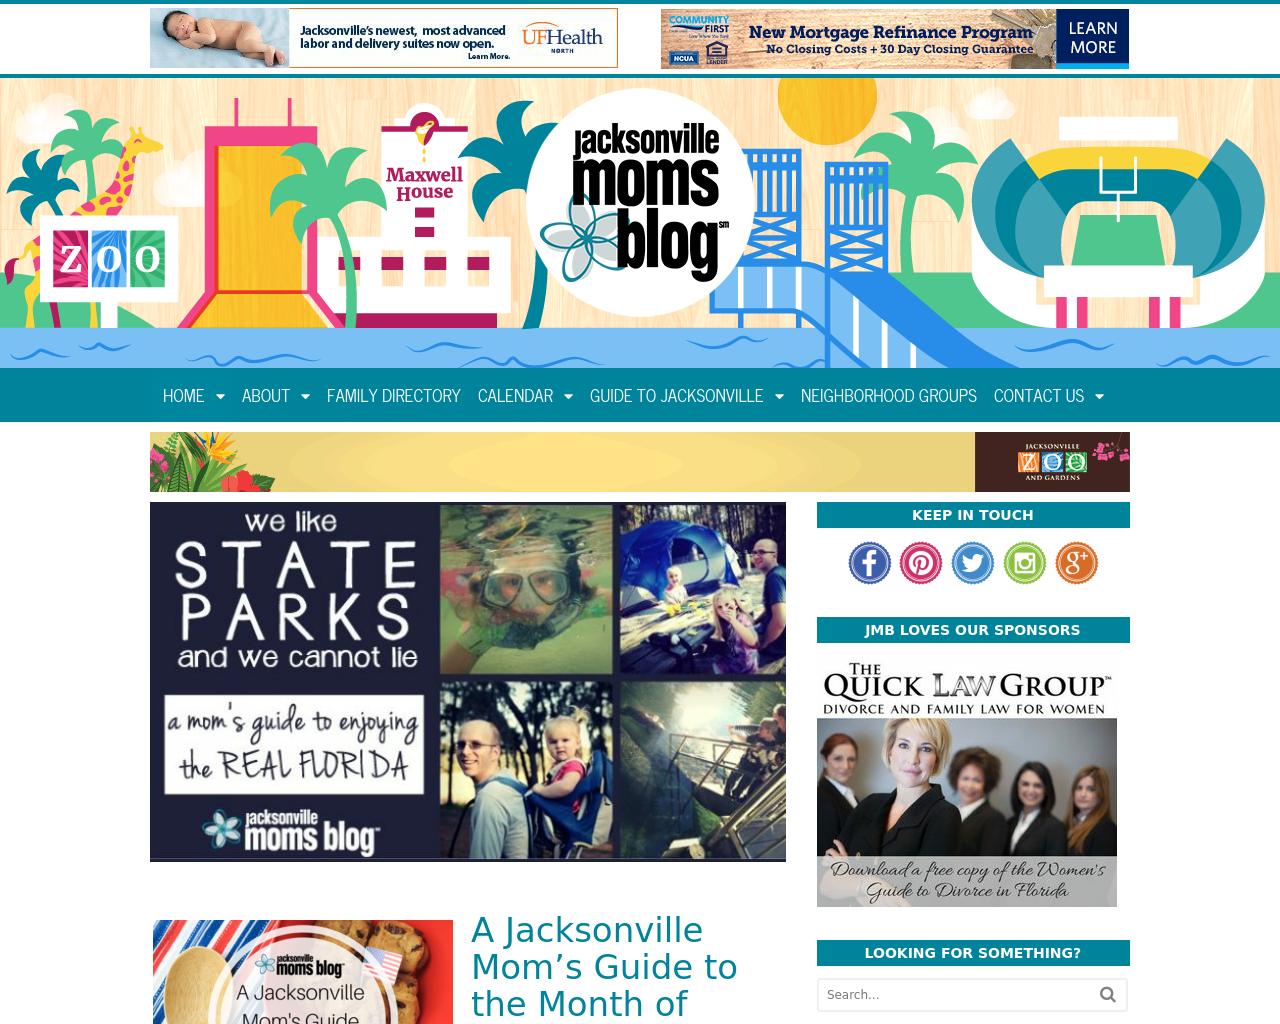 Jacksonville-Moms-Blog-Advertising-Reviews-Pricing